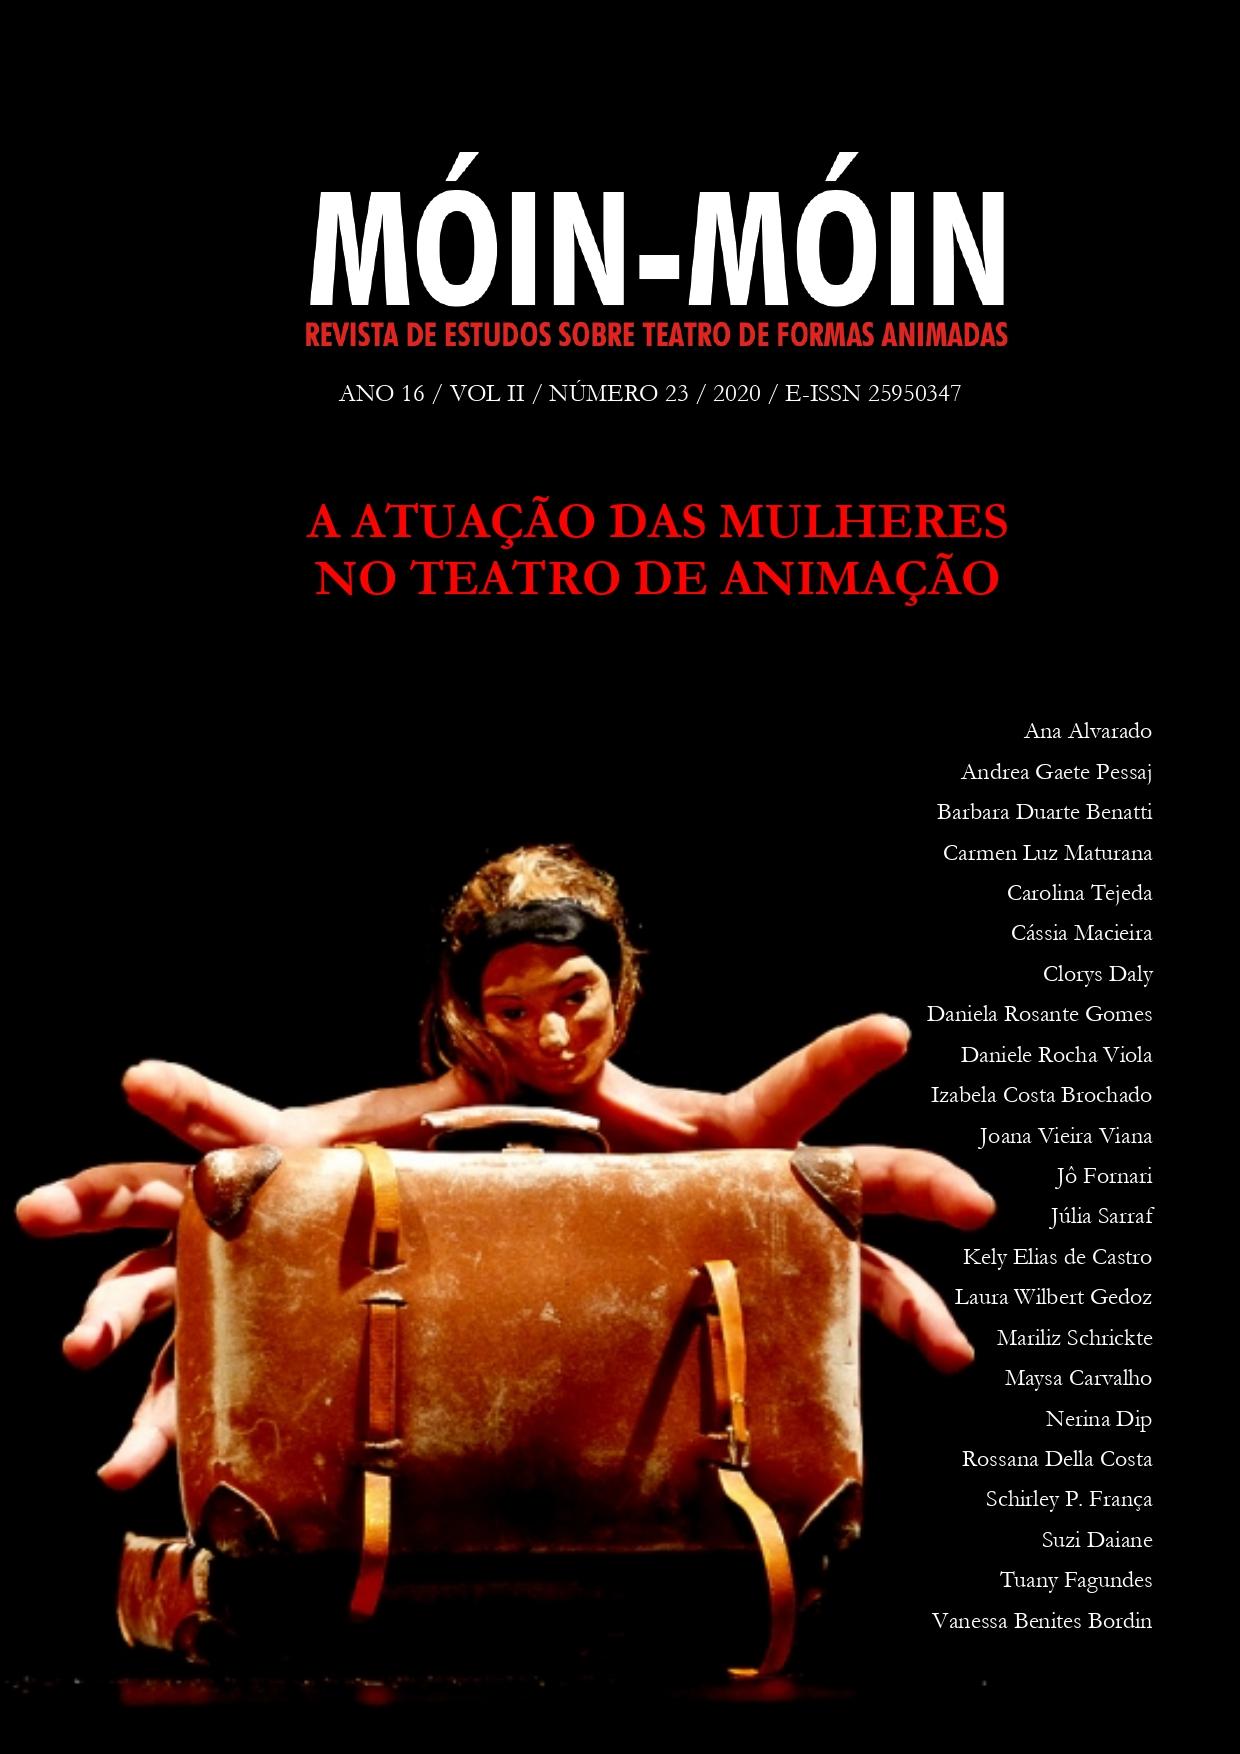 Foto da capa: Espetáculo Desde el azur, de Inés Pasic. Fotógrafo: Jesús Atienza.